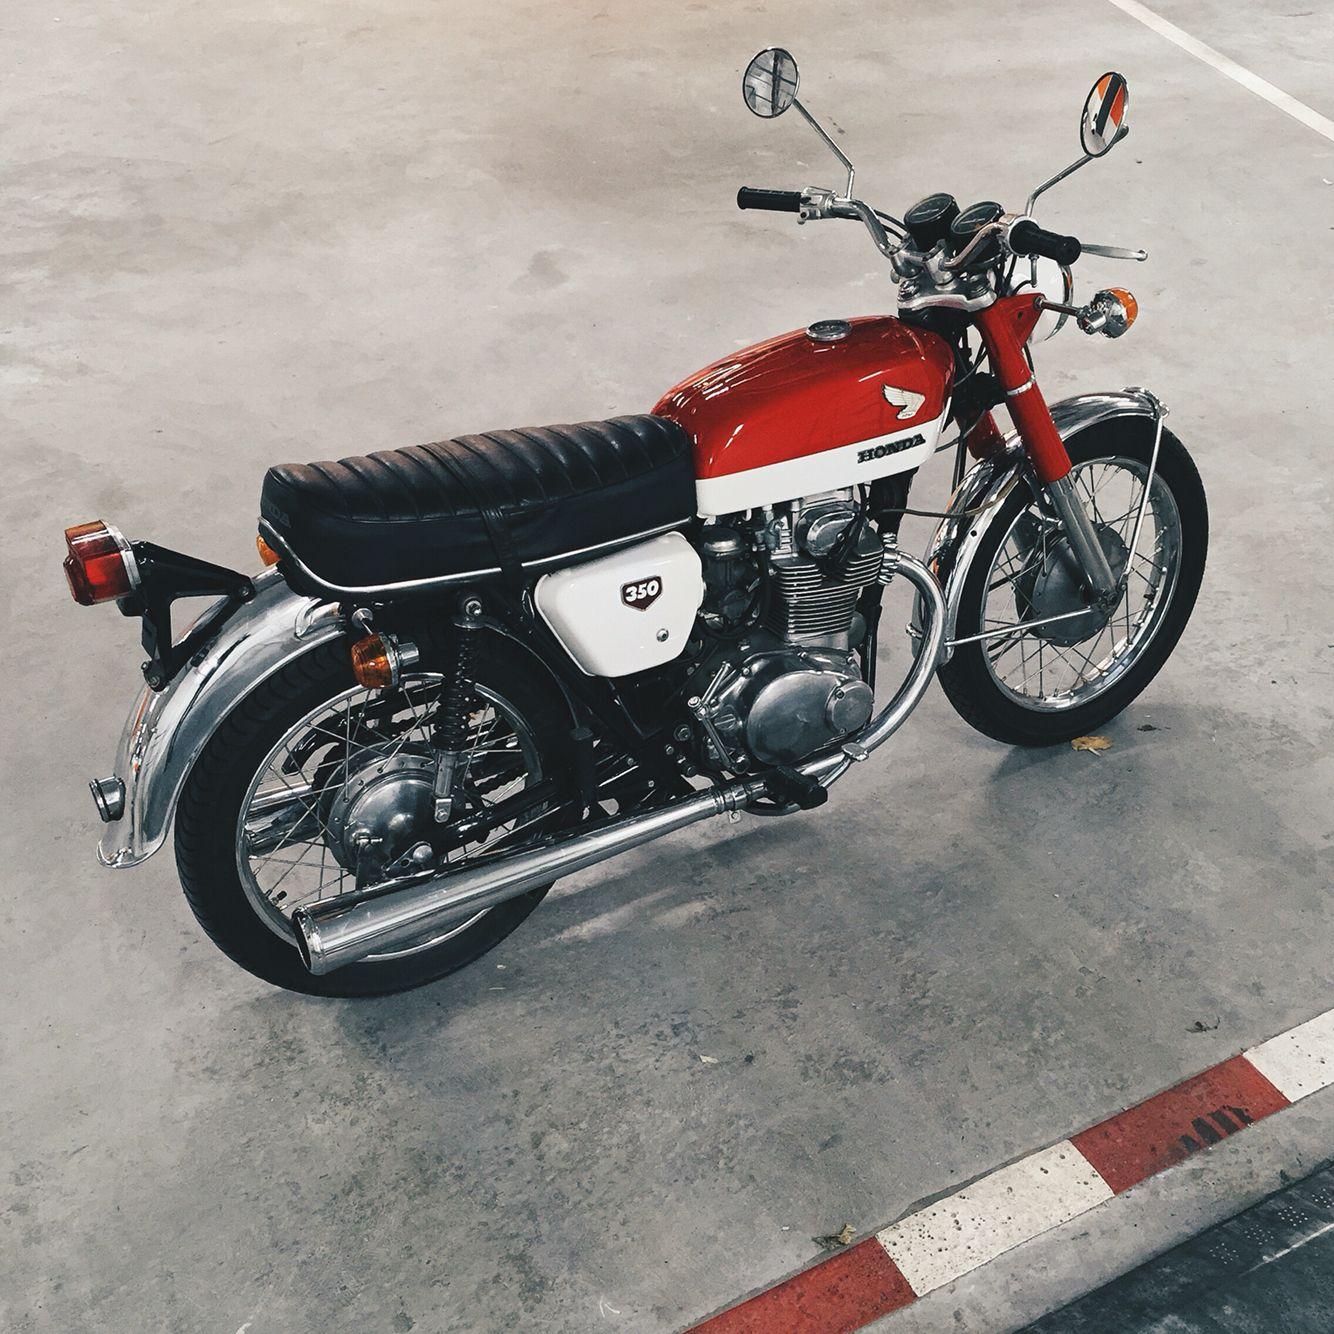 Honda Cb350 1970 Cb350 Cafe Racer Vintage Honda Motorcycles Cafe Racer